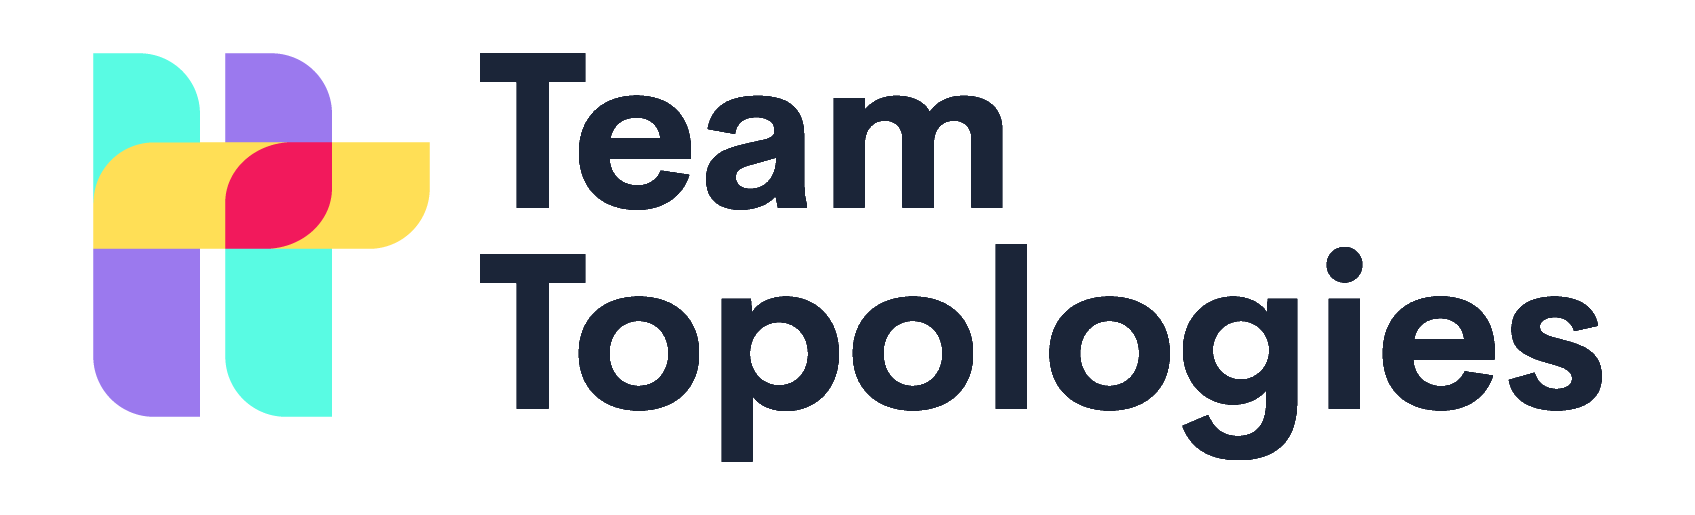 main-logo-blue-text.png